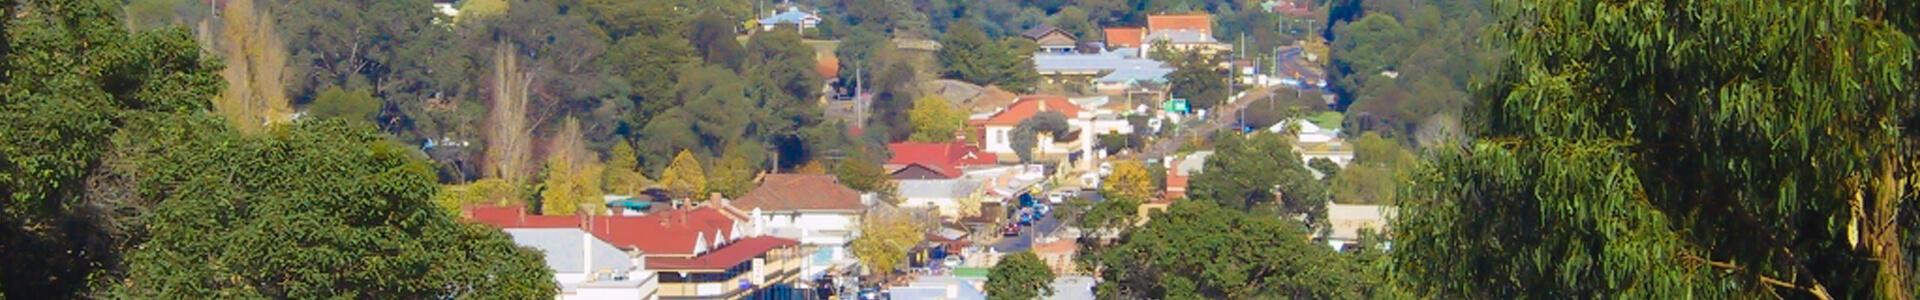 Bridgetown Overview